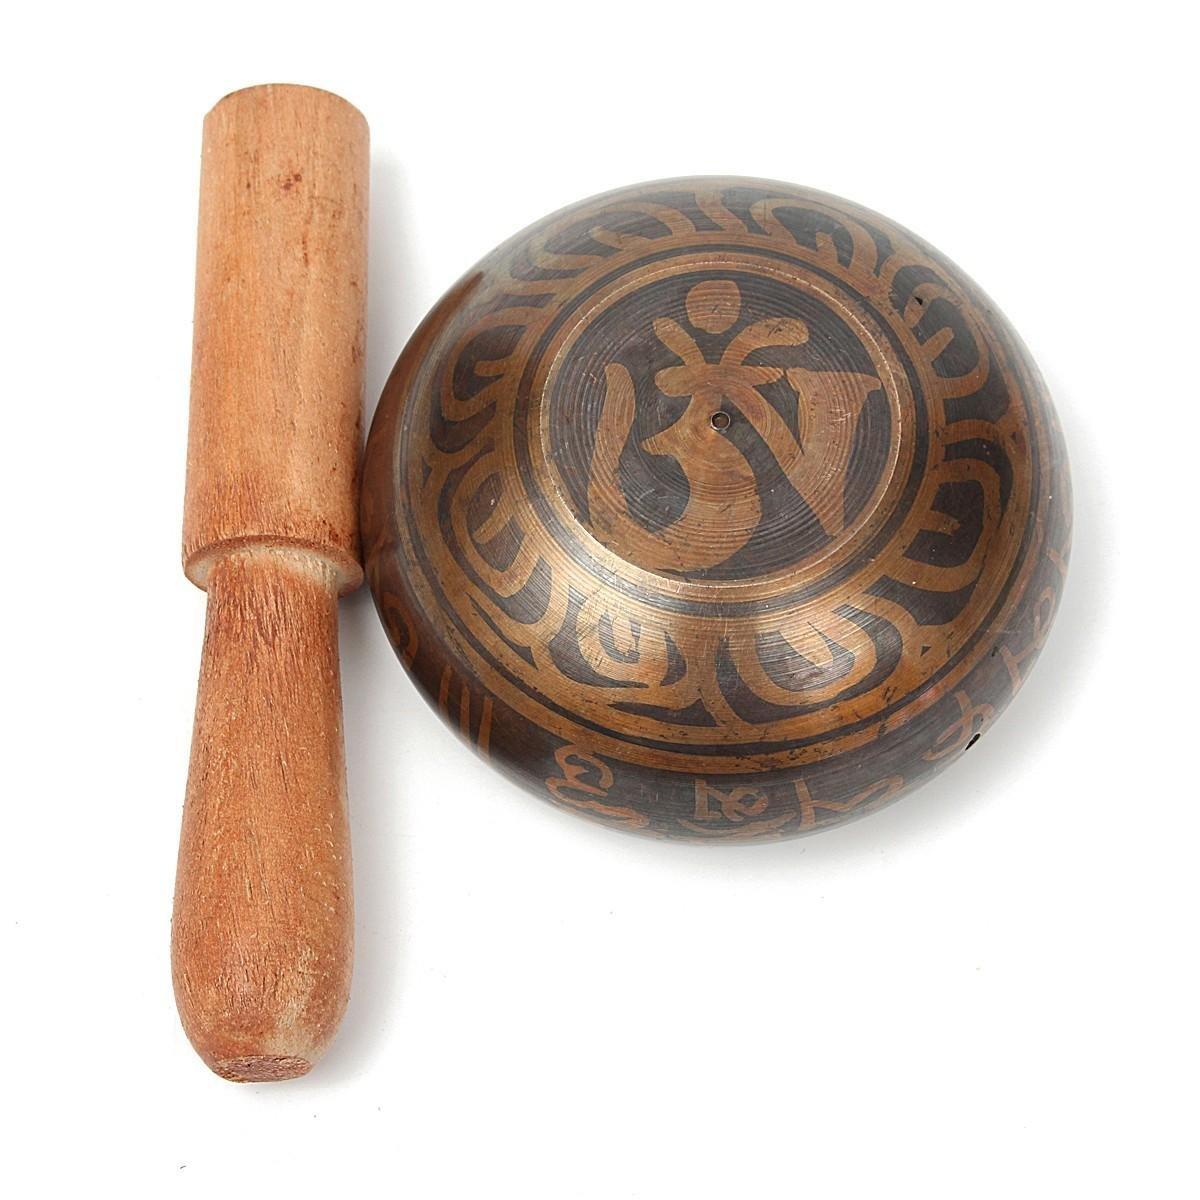 Yoga Singing Bowl - Yoga Meditation Bowl - Gilt Bronze Yoga Singing Bowl Buddhist Resonance Chakra Meditation With Hammered (Yoga Singing Bowl Set)